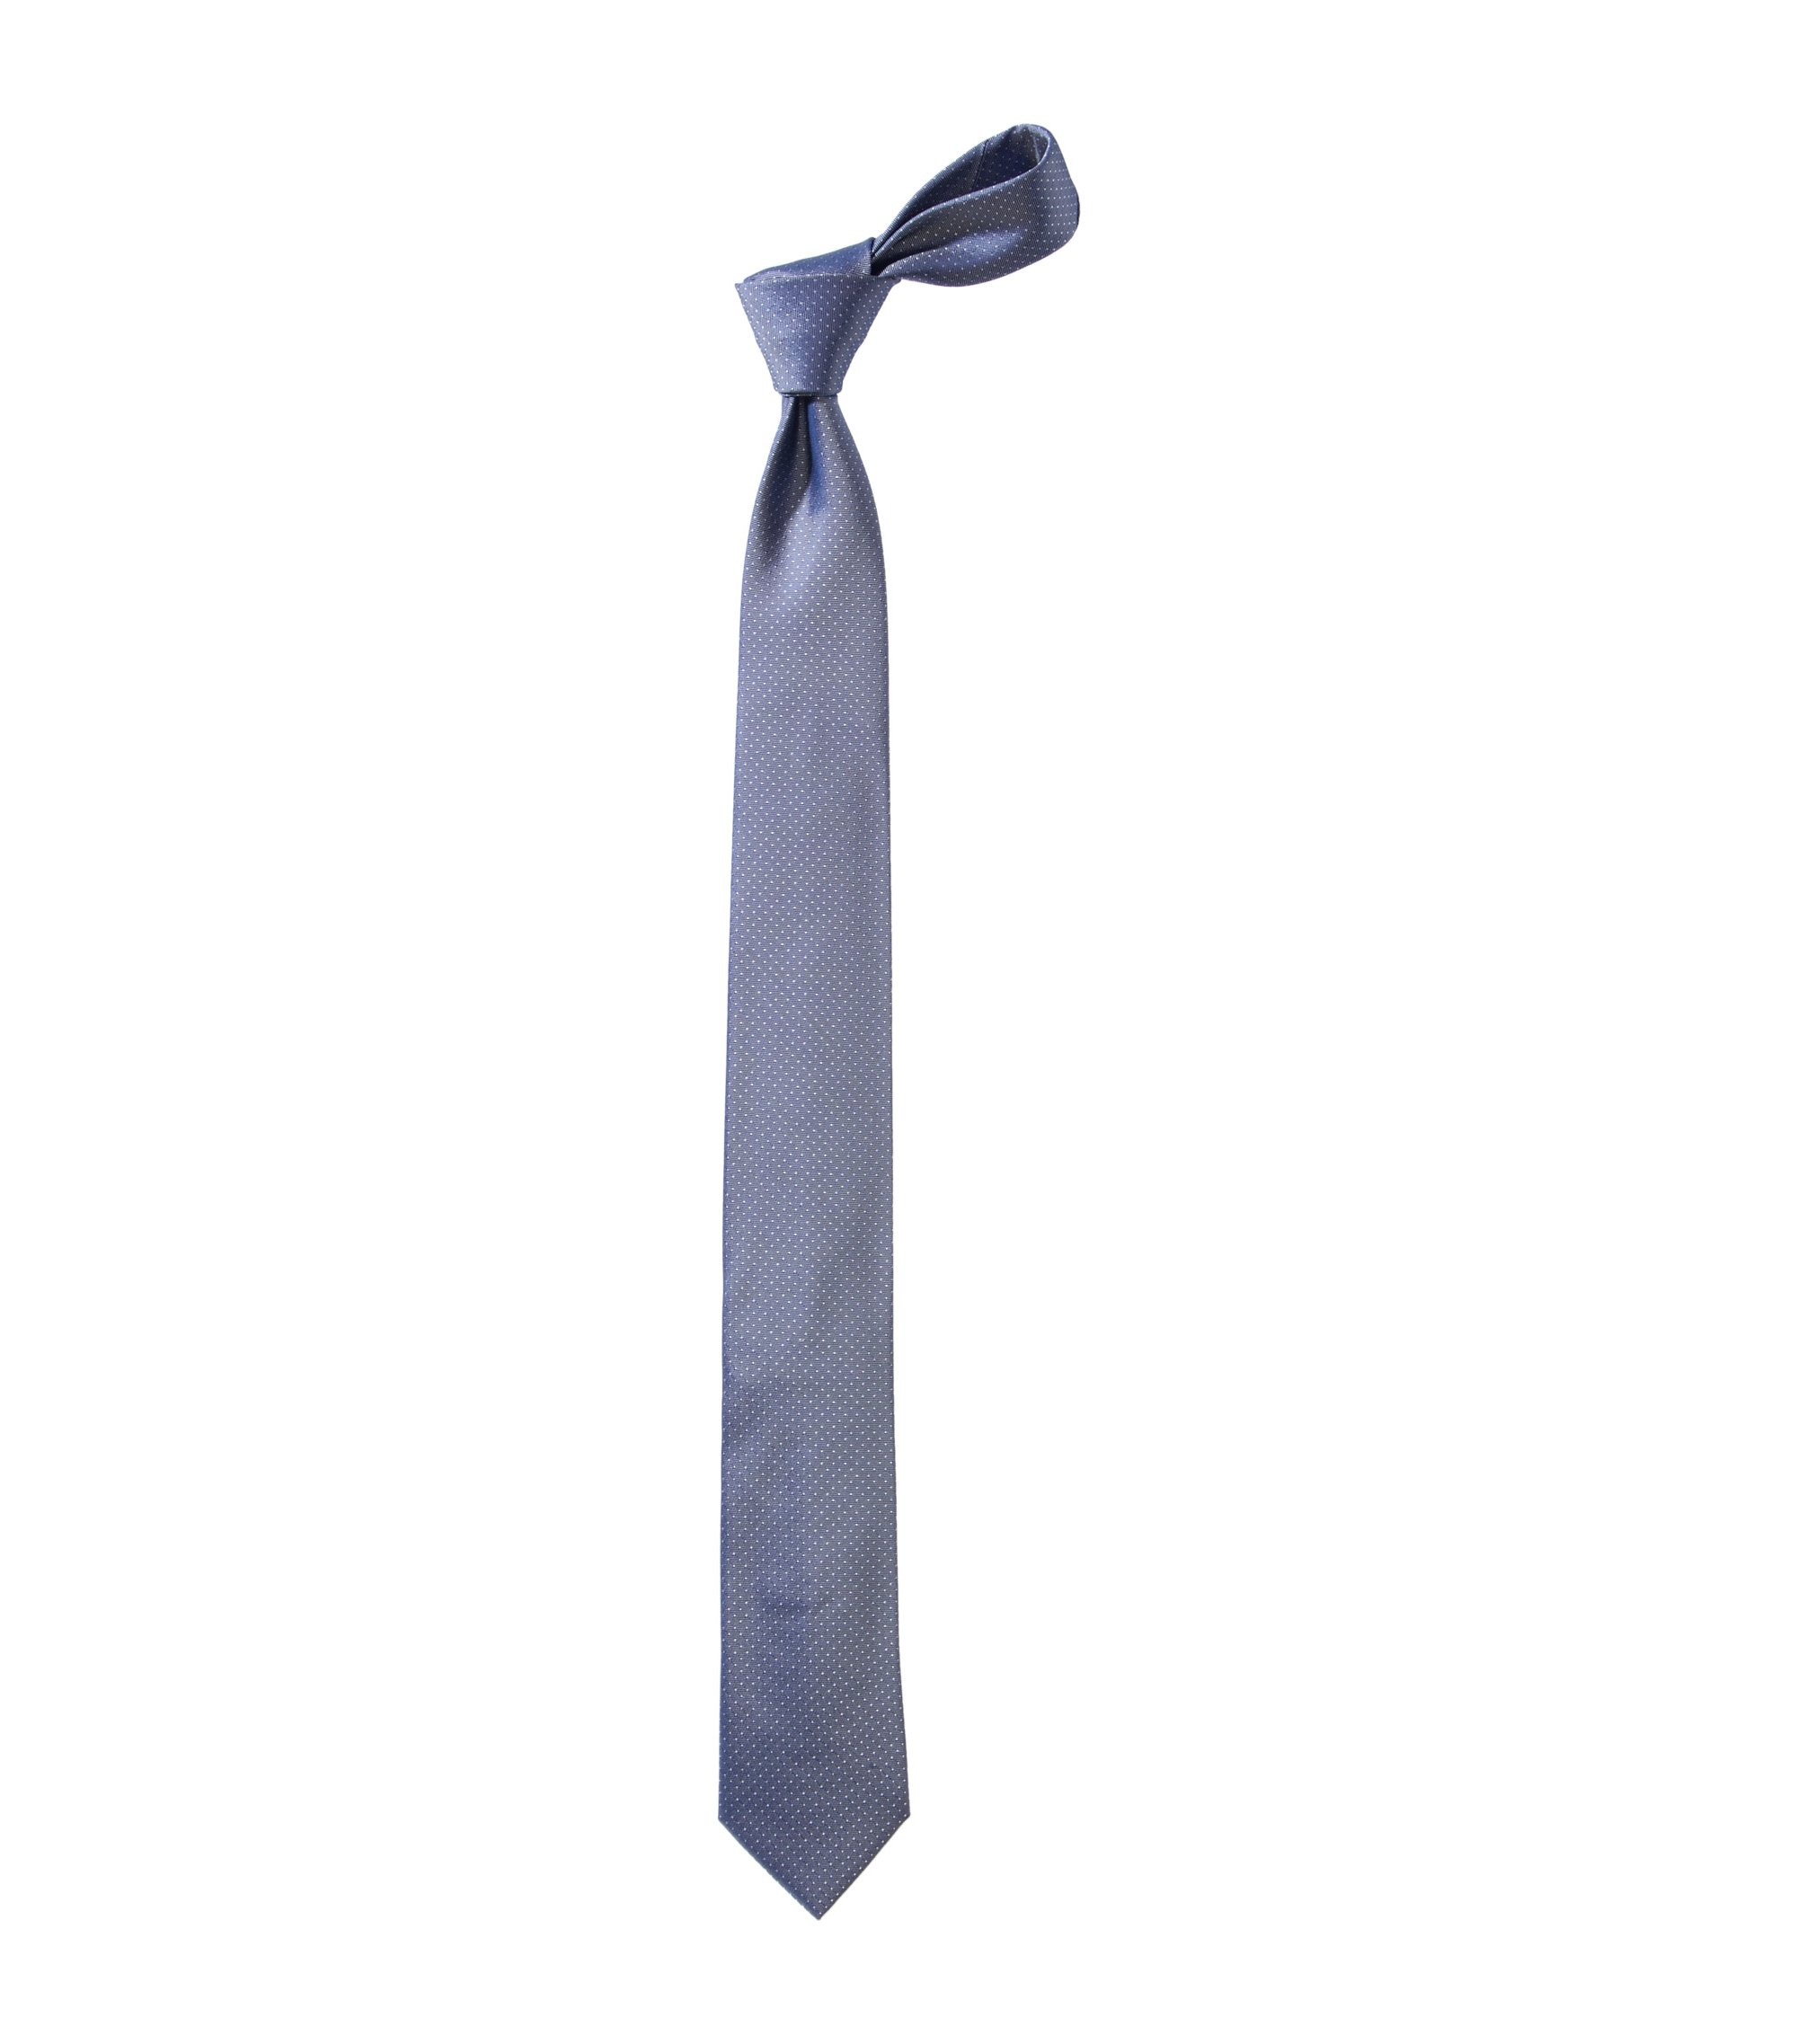 Karierte Krawatte ´Tie 6 cm`, Dunkelblau